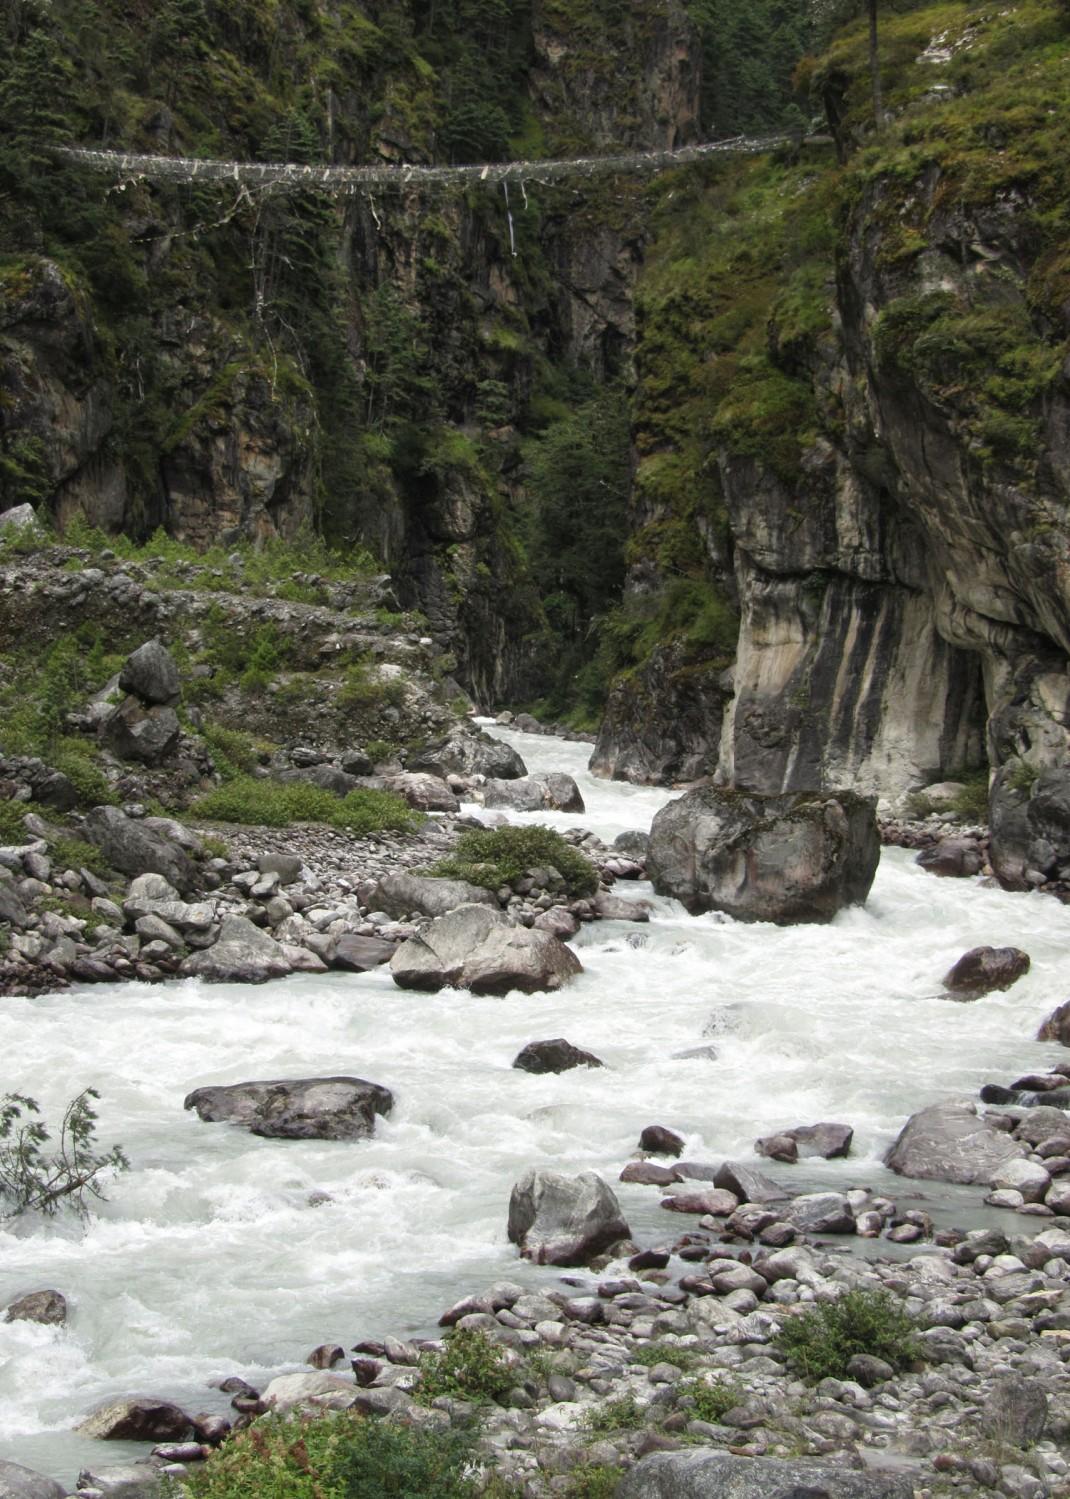 Nepal-Everest-Region-Trek-Day-02-High-Bridge